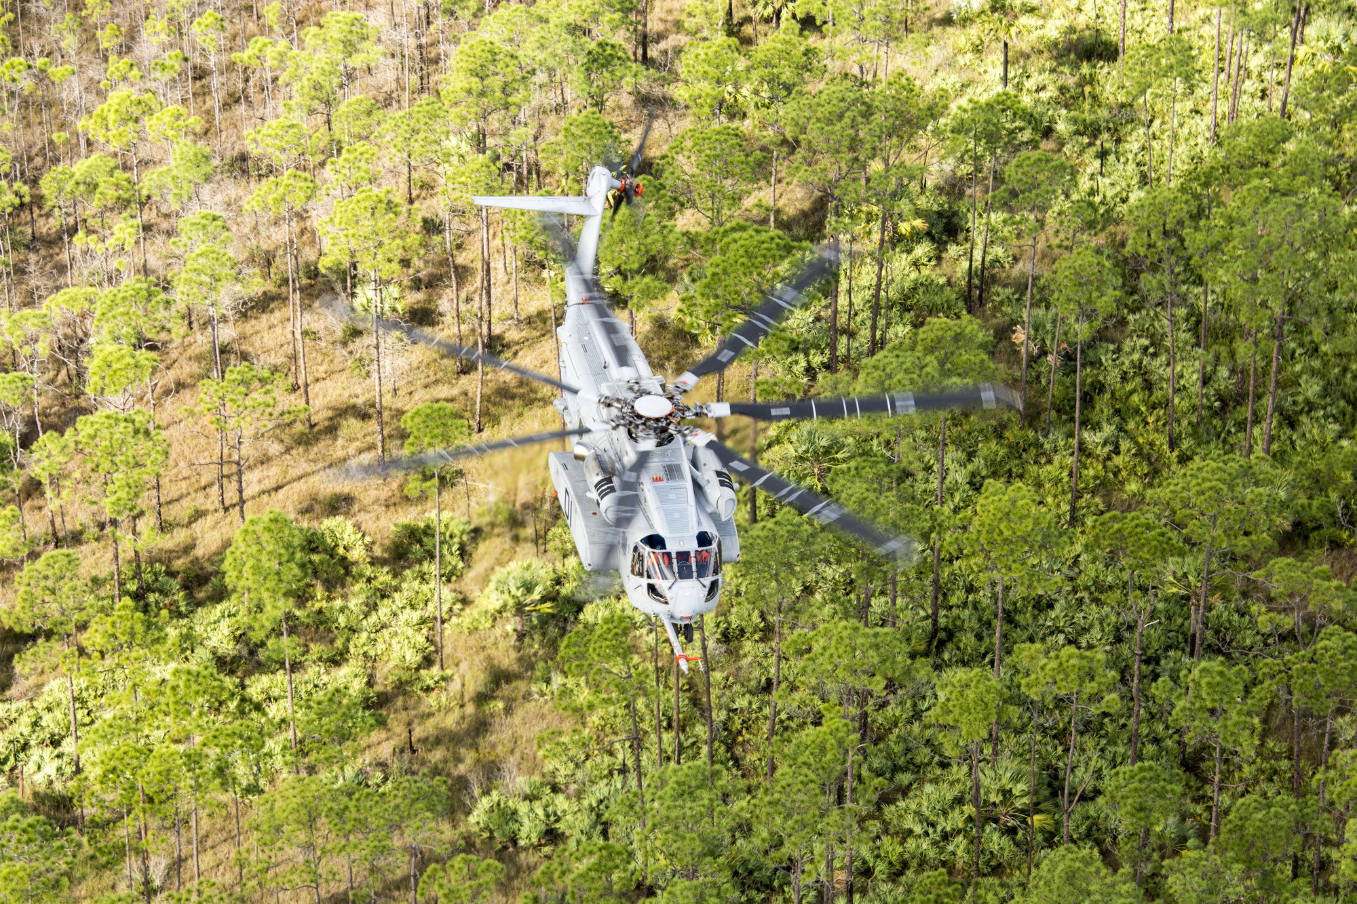 Lockheed Martin to begin CH-53K King Stallion production